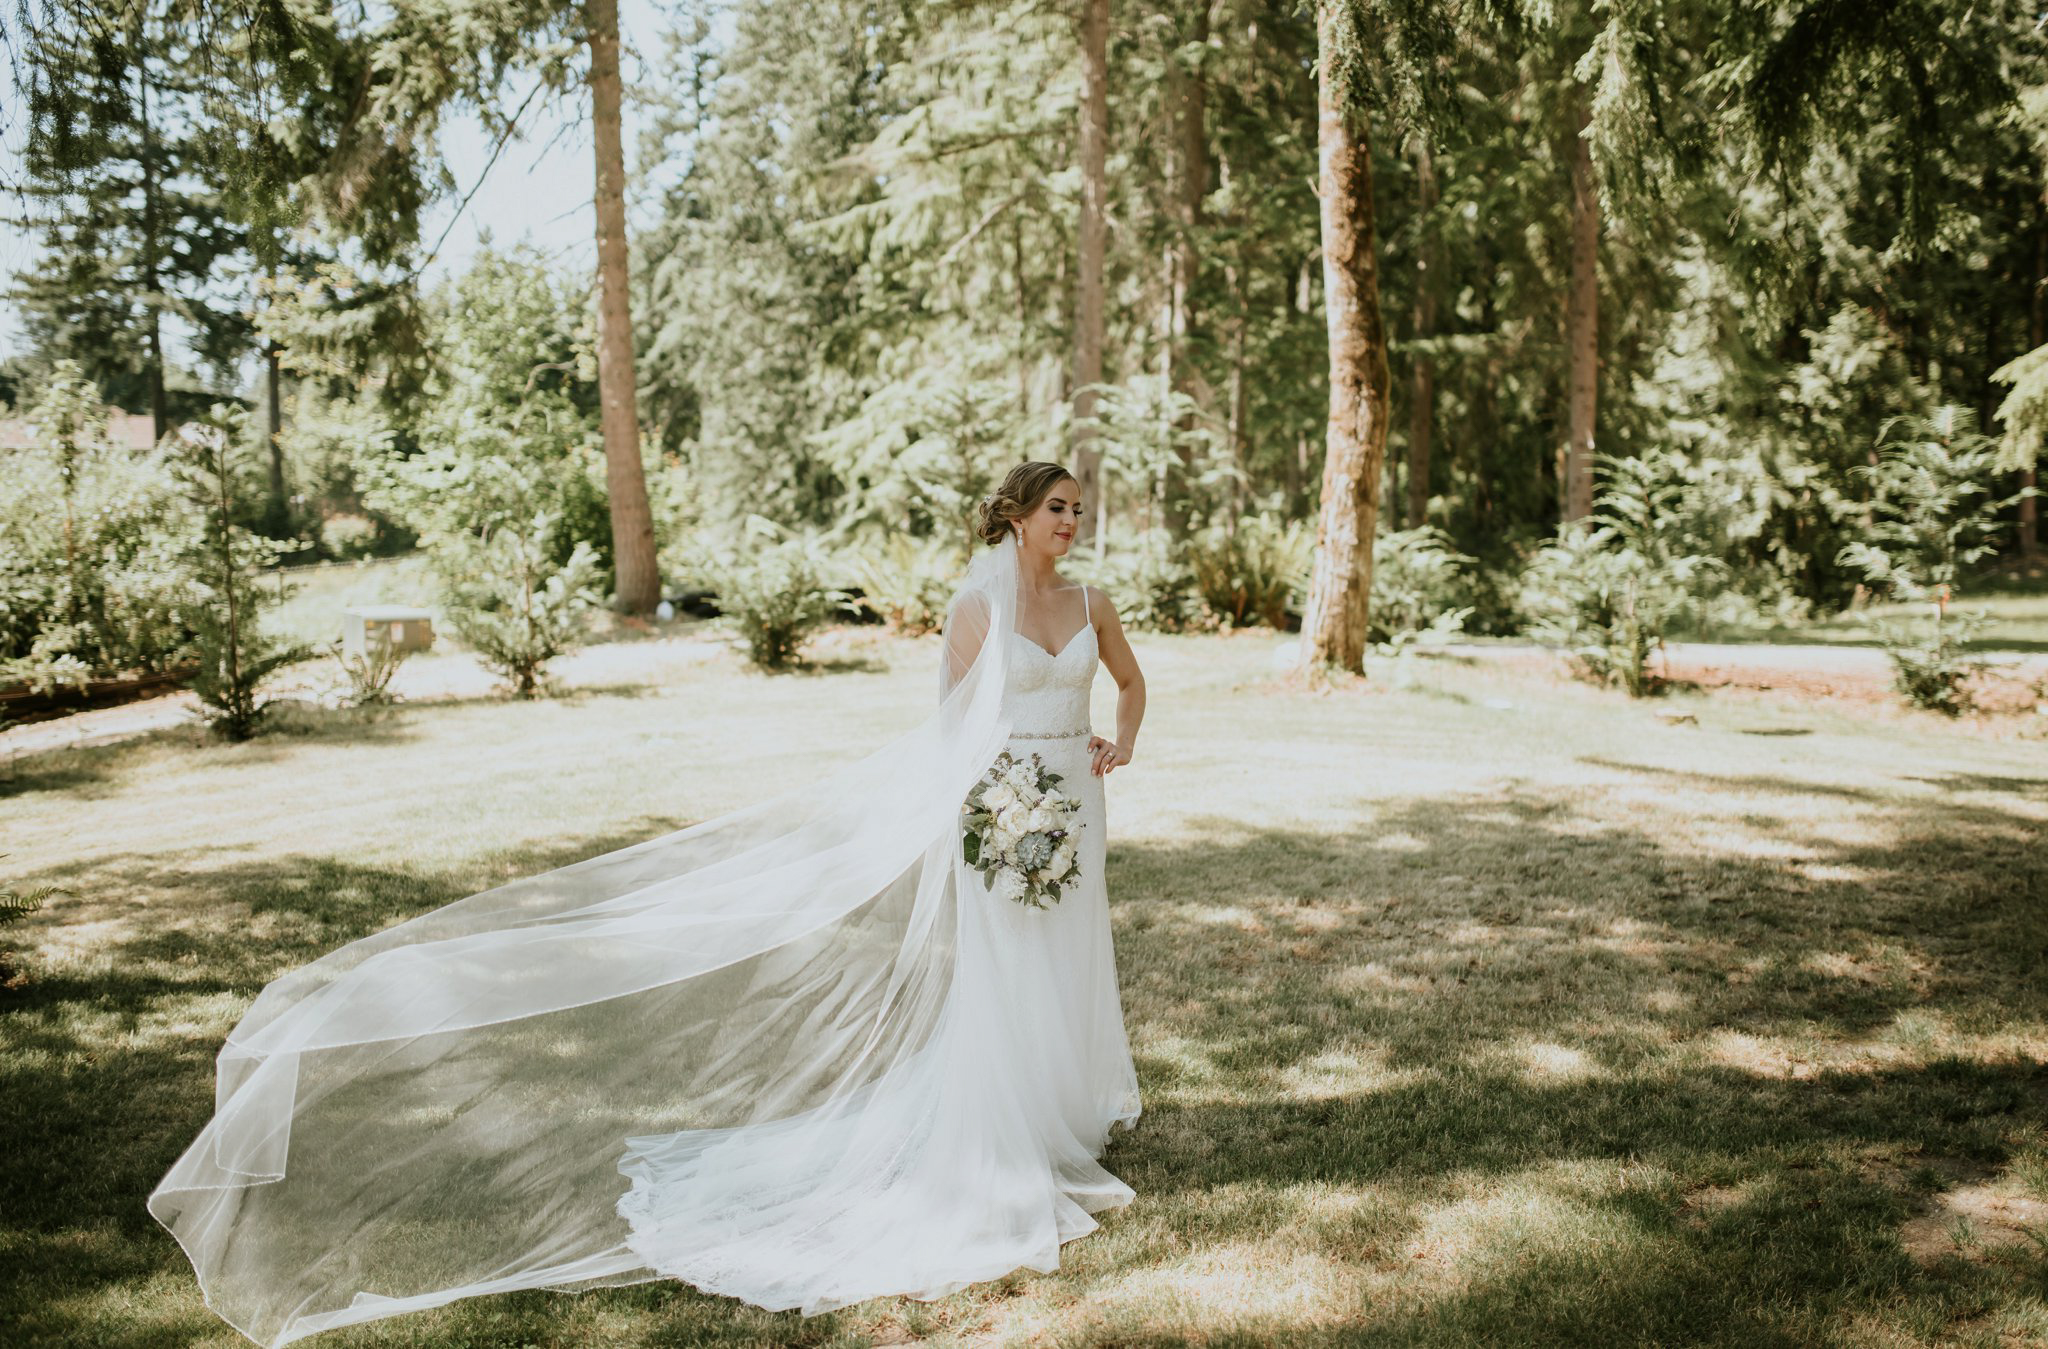 hollywood-school-house-wedding-seattle-photographer-caitlyn-nikula-29.jpg